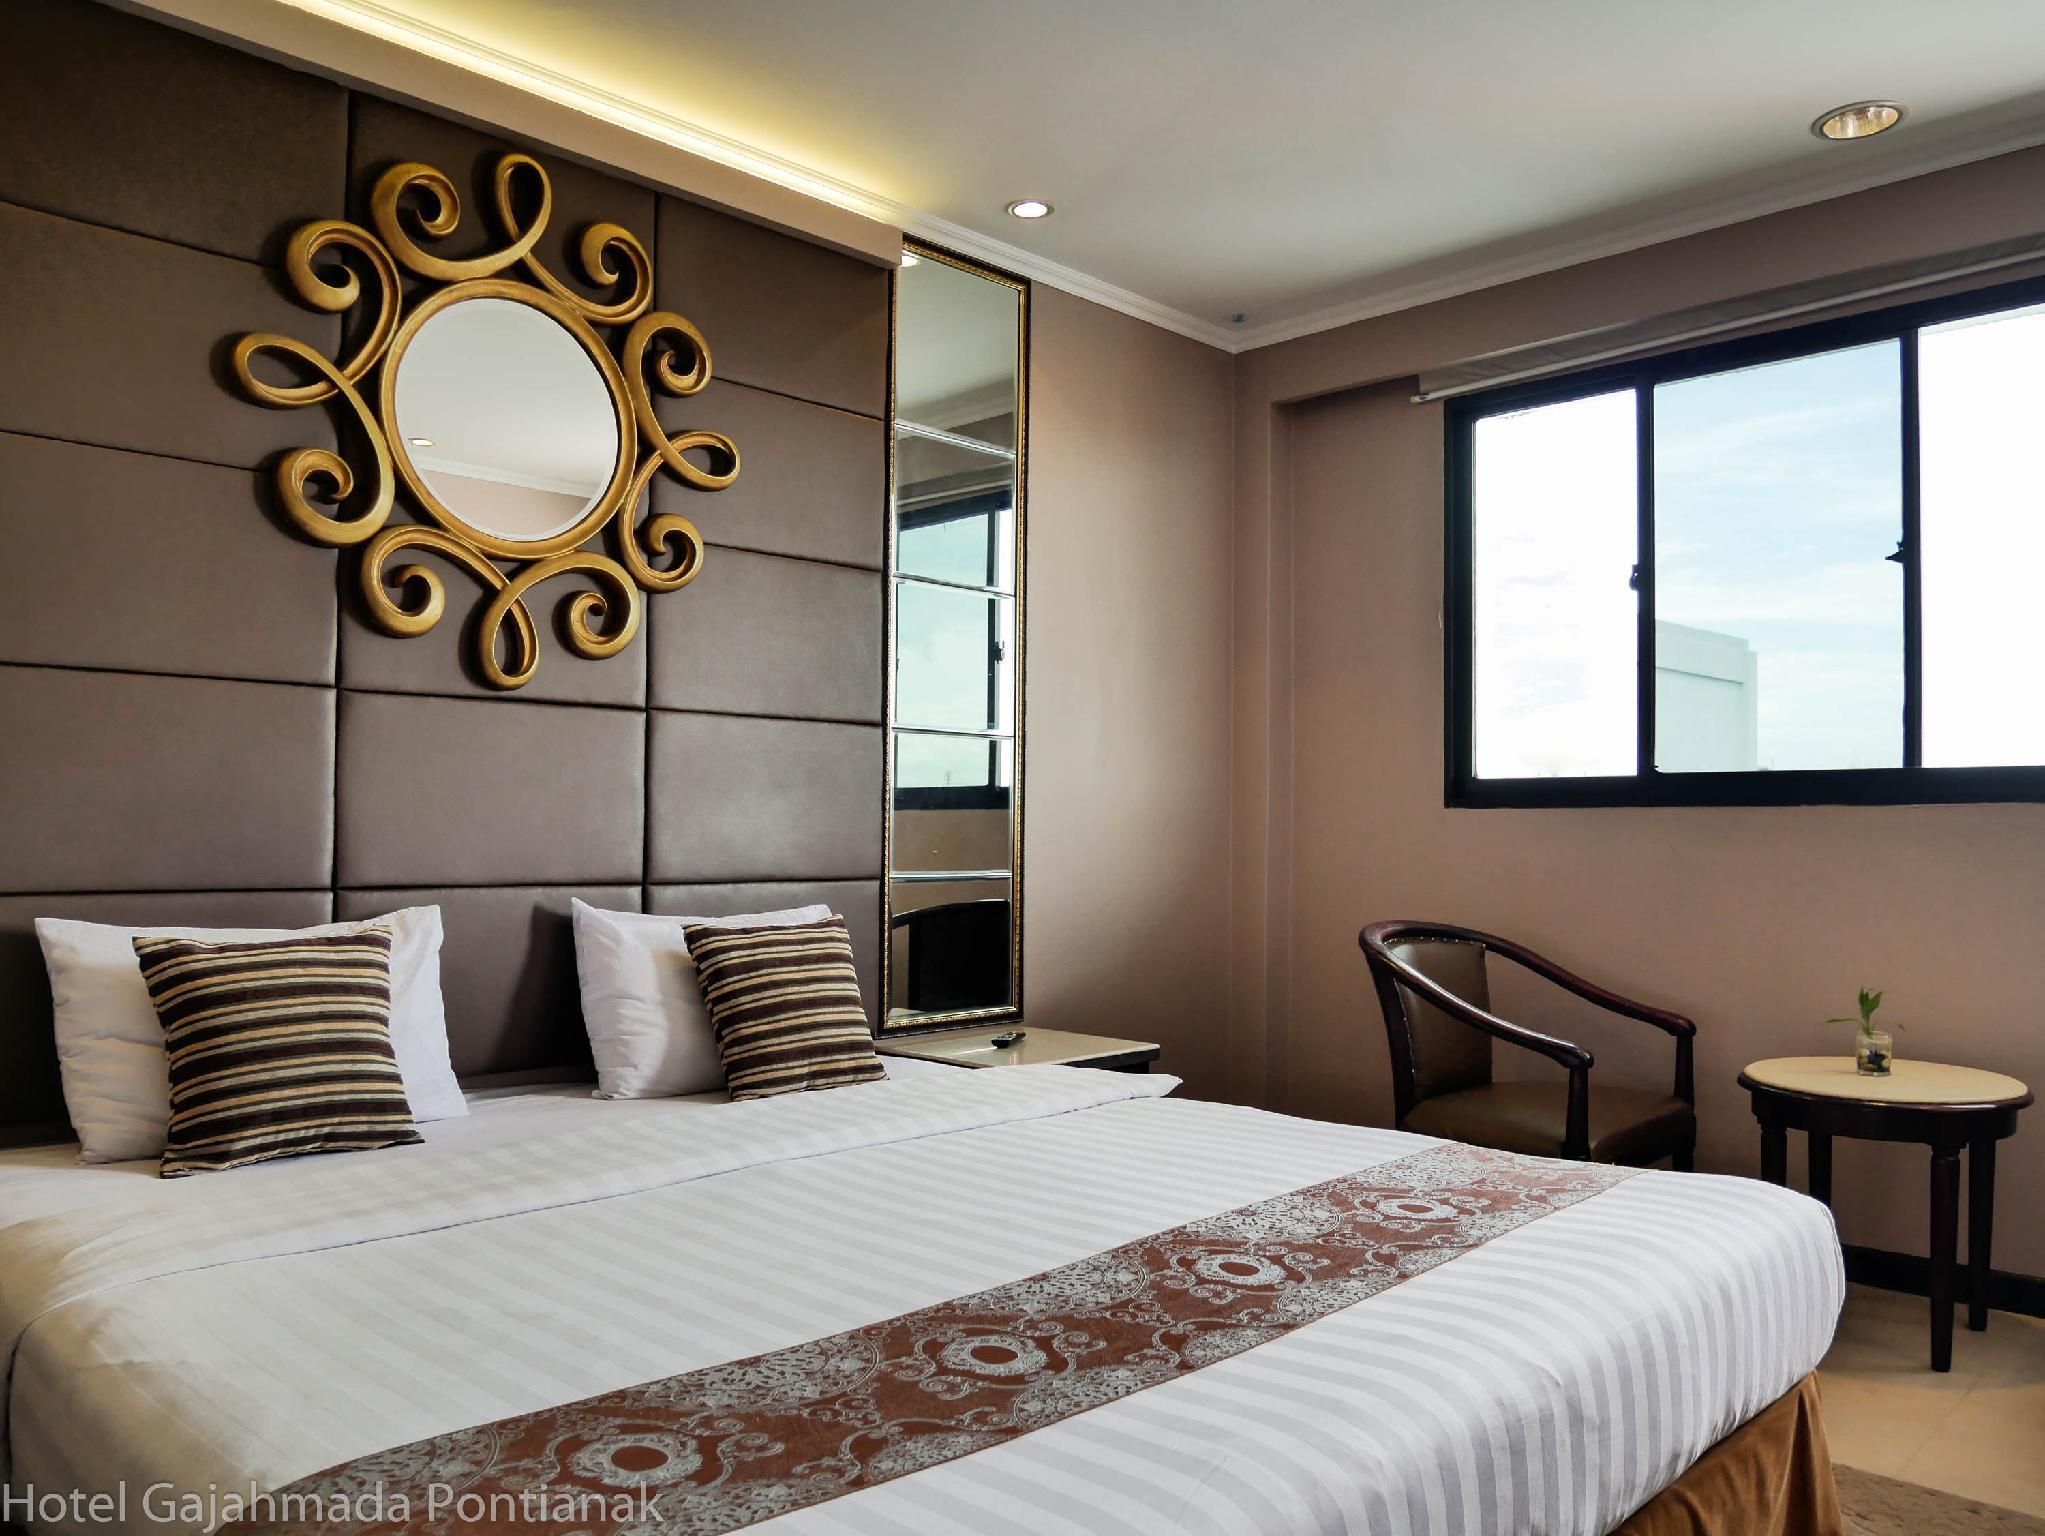 Gajahmada Hotel Pontianak